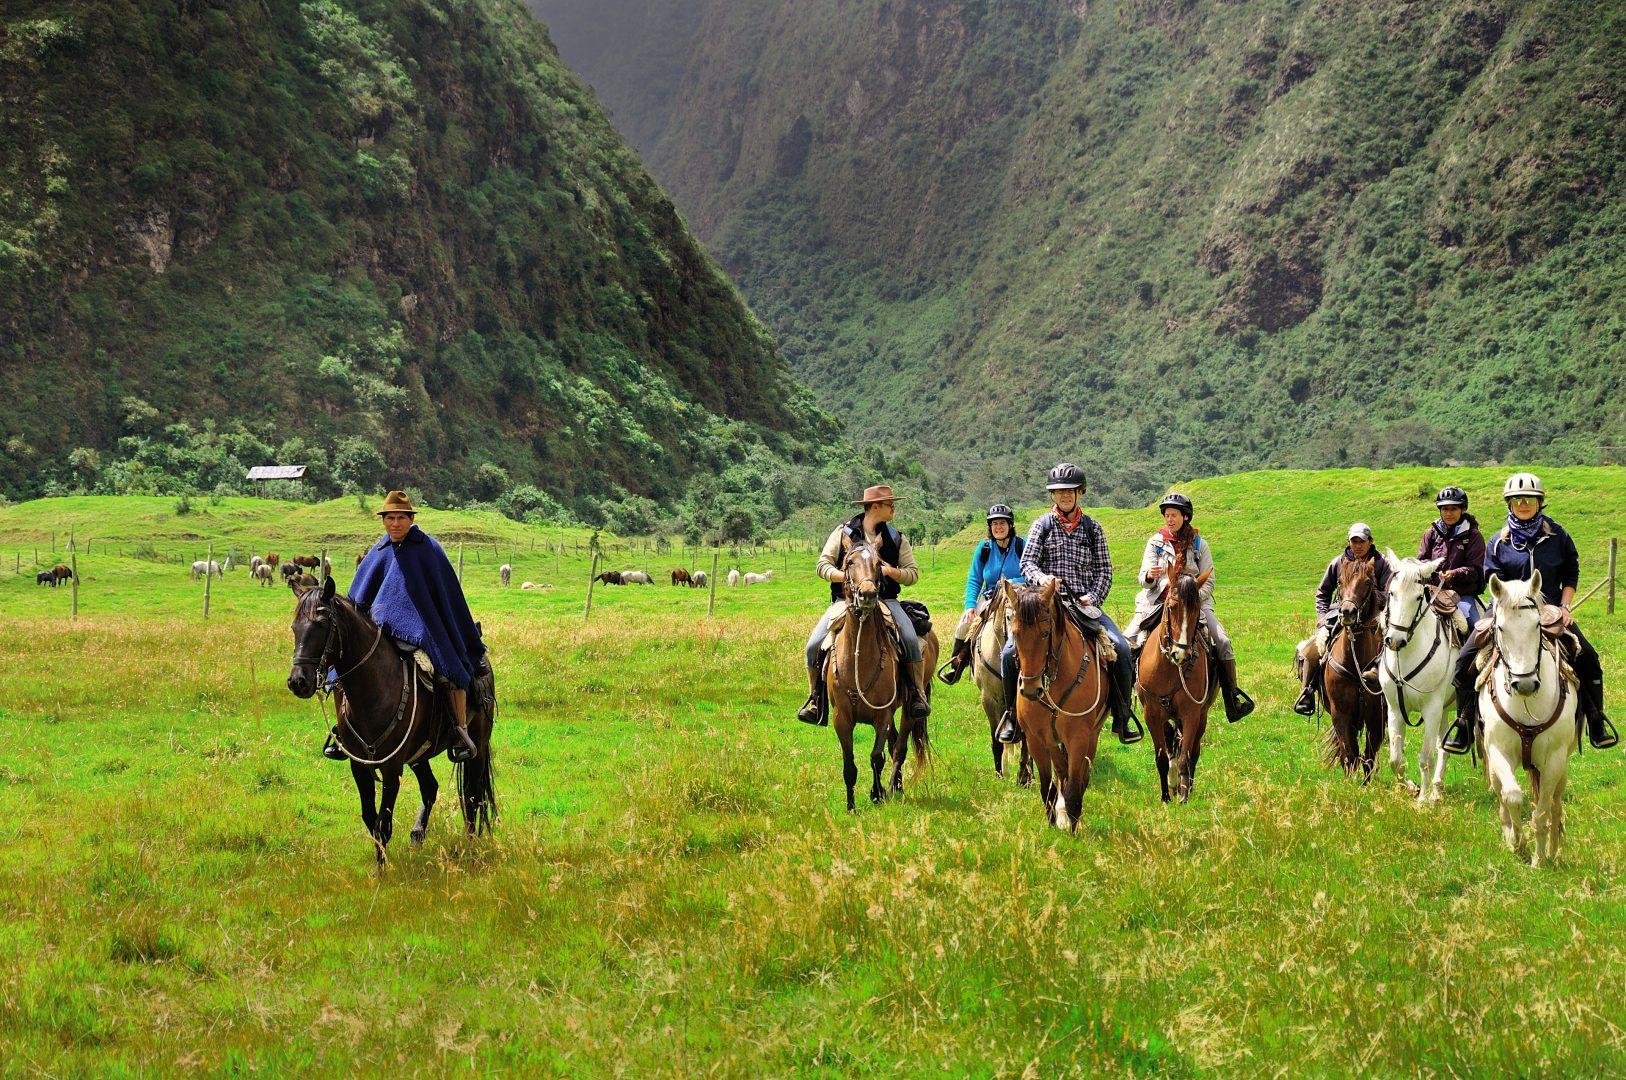 Horseback riding at the unmatched Hacienda Zuleta